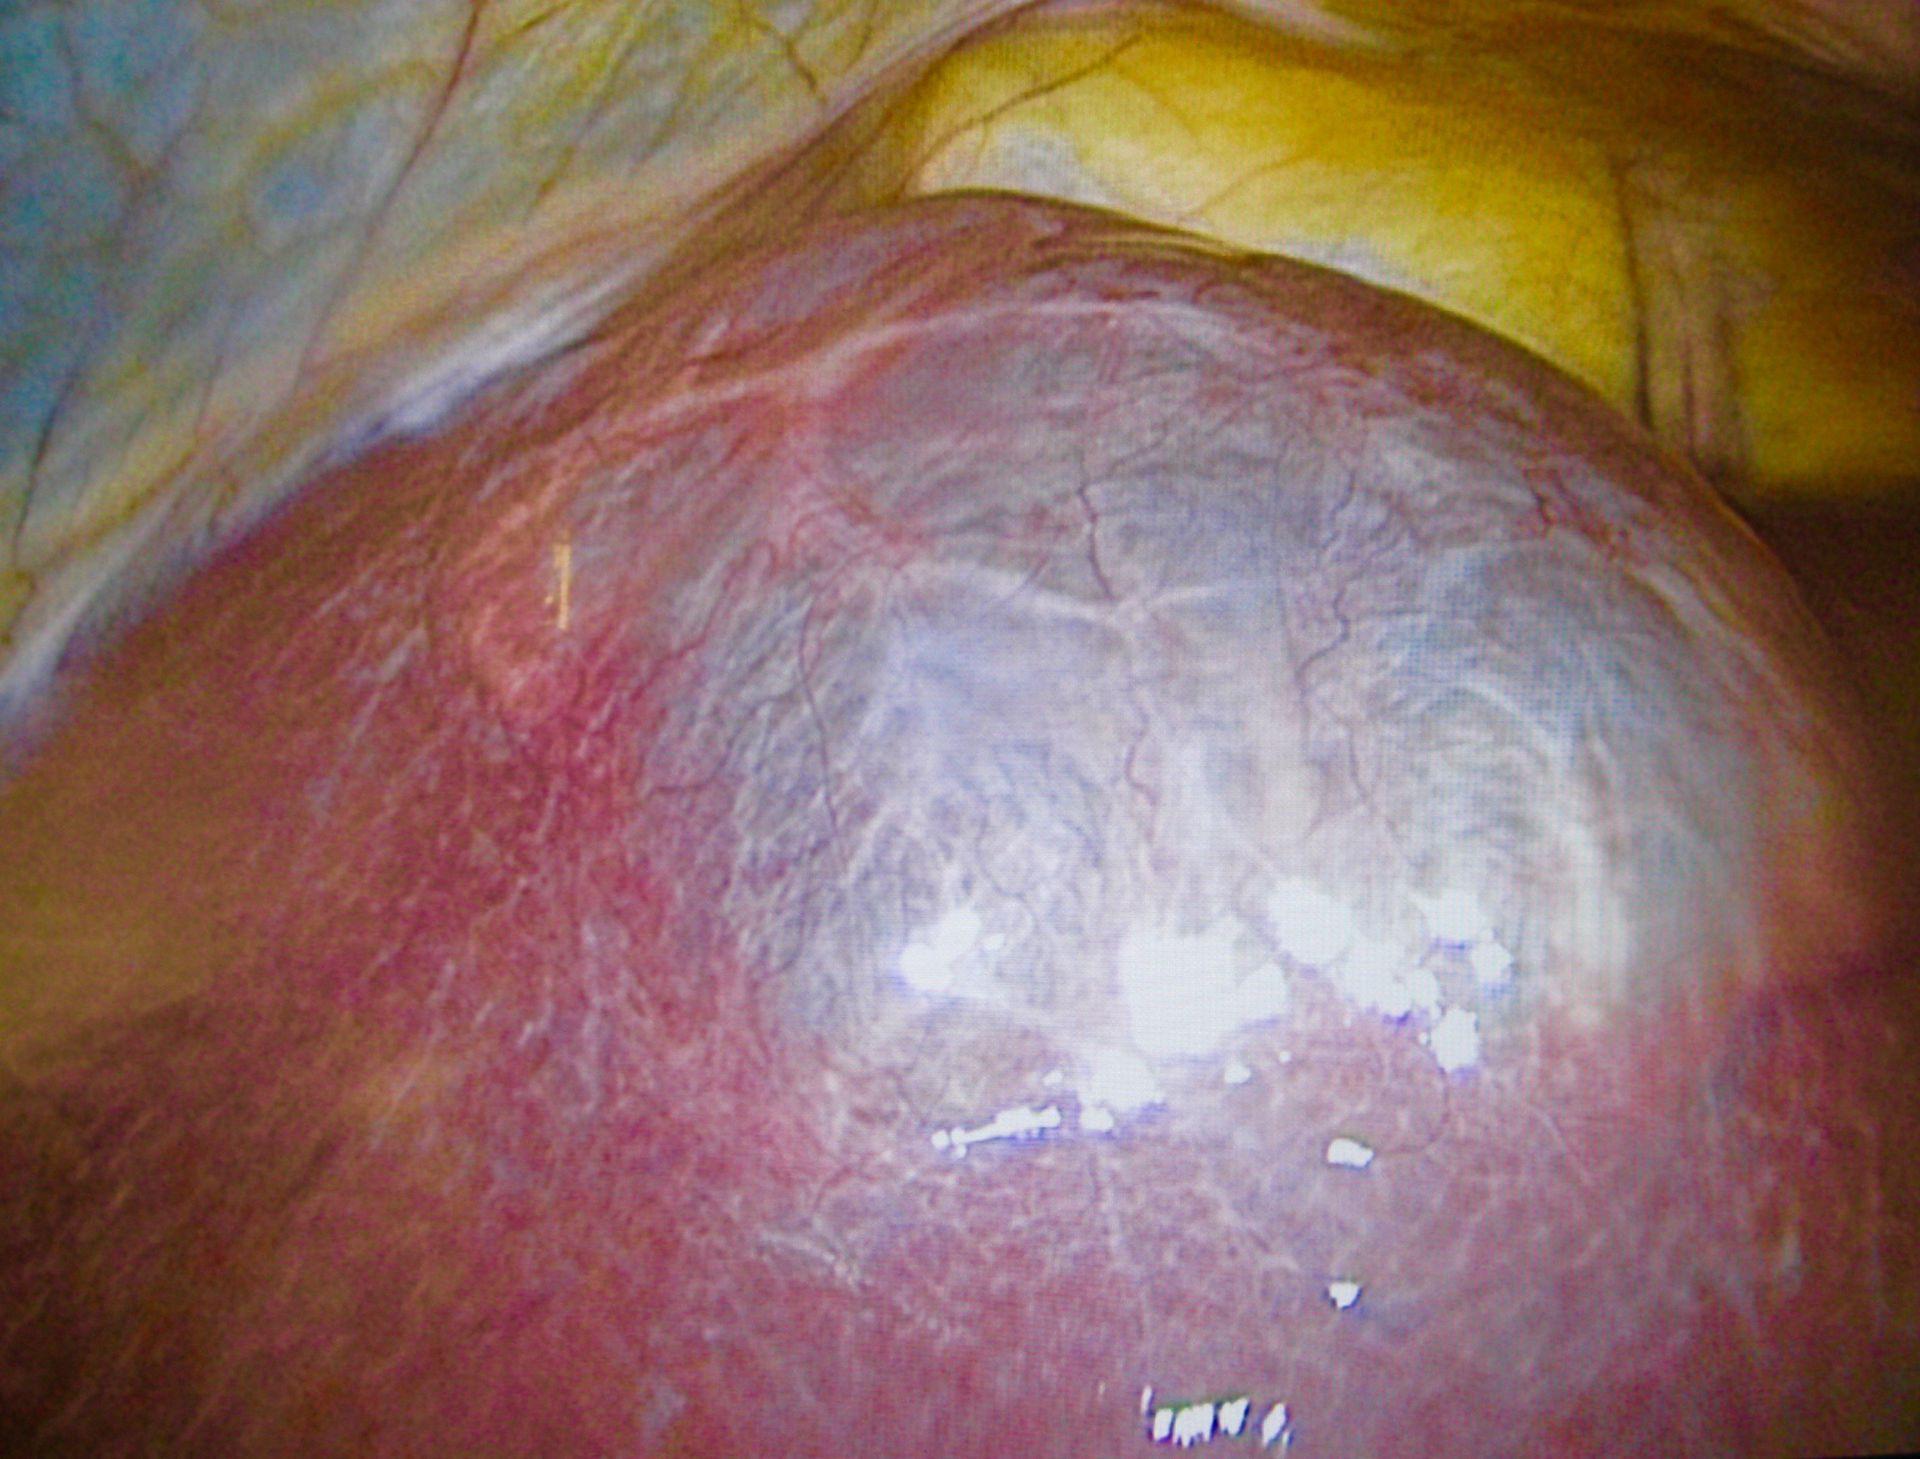 Große Lebercyste-Laparoskopie